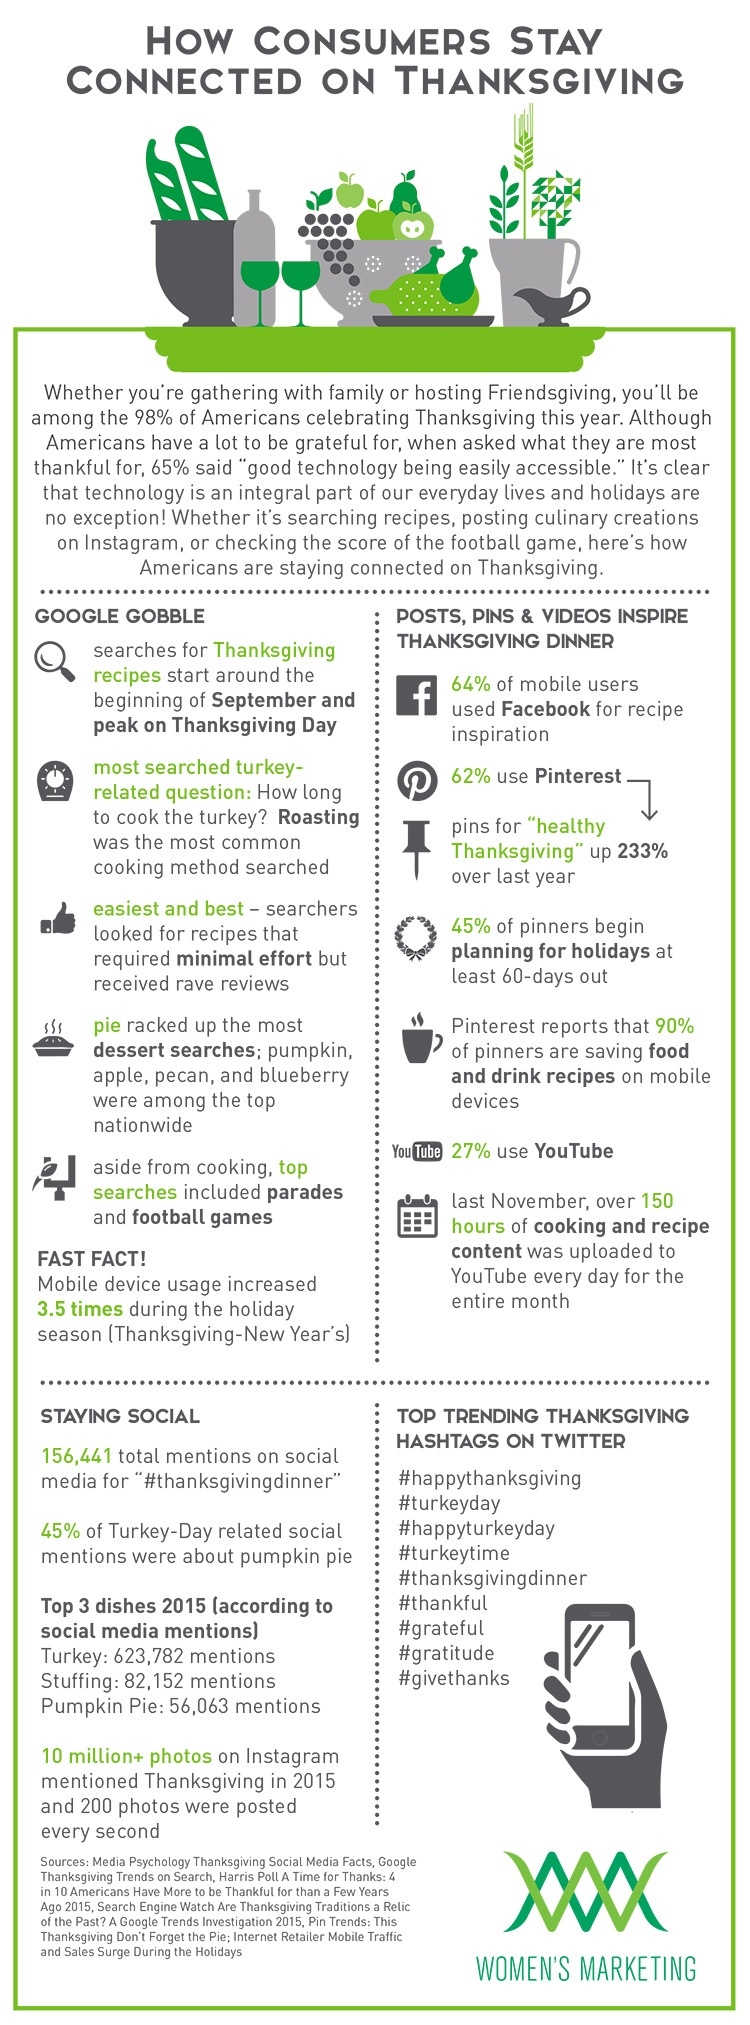 HowConsumersStayConnectedonThanksgiving_infographic.jpg